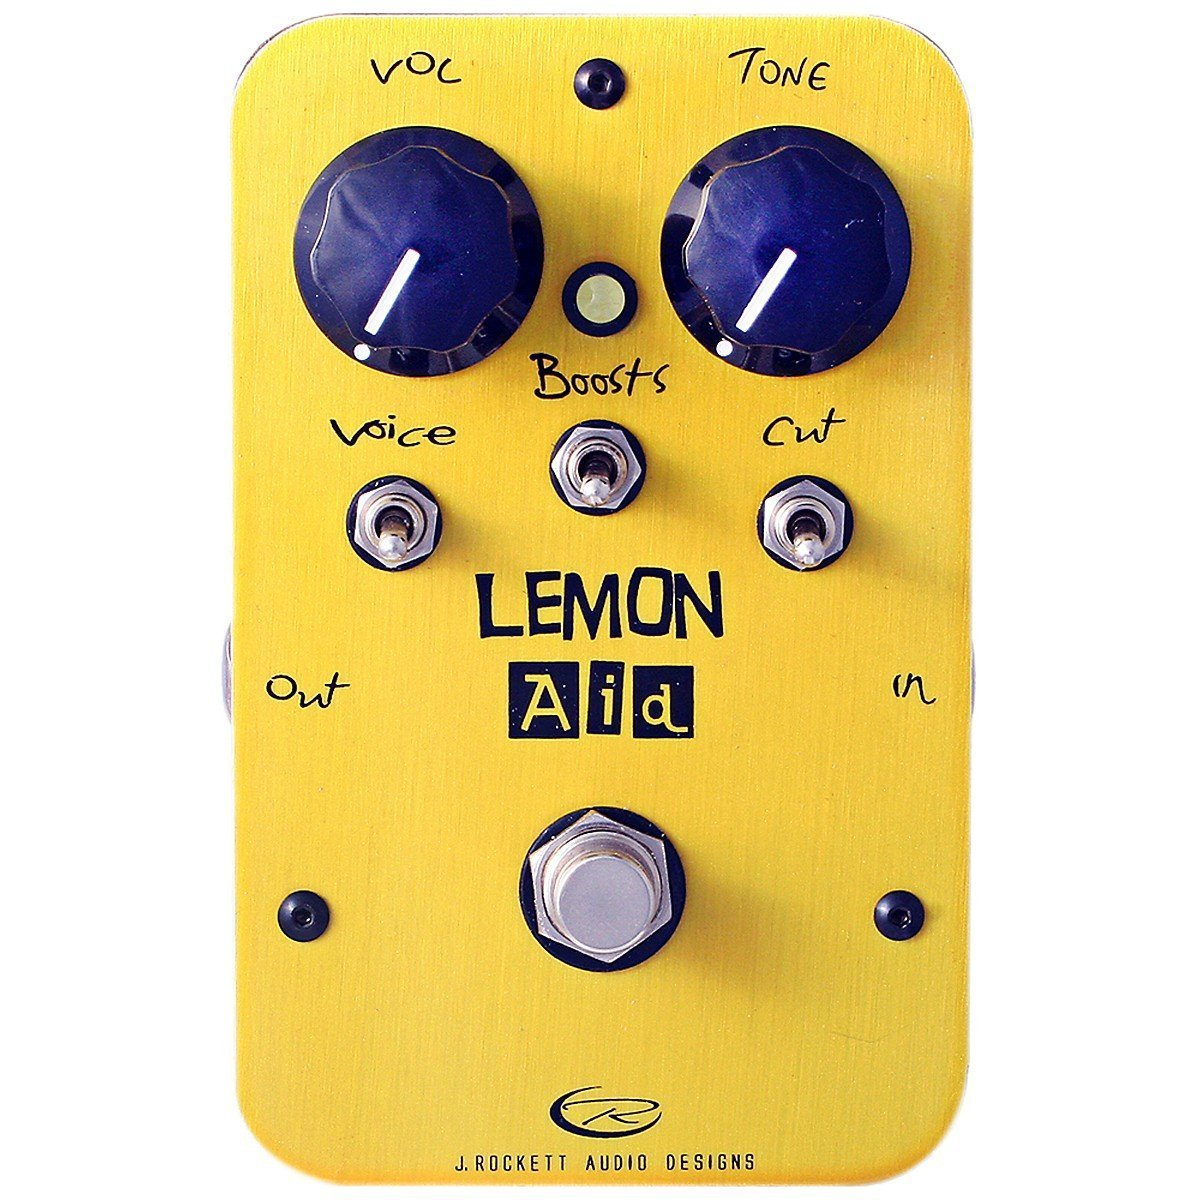 Amazon.com: Rockett Pedals Lemon Aid Multi Boost Guitar Effects ...